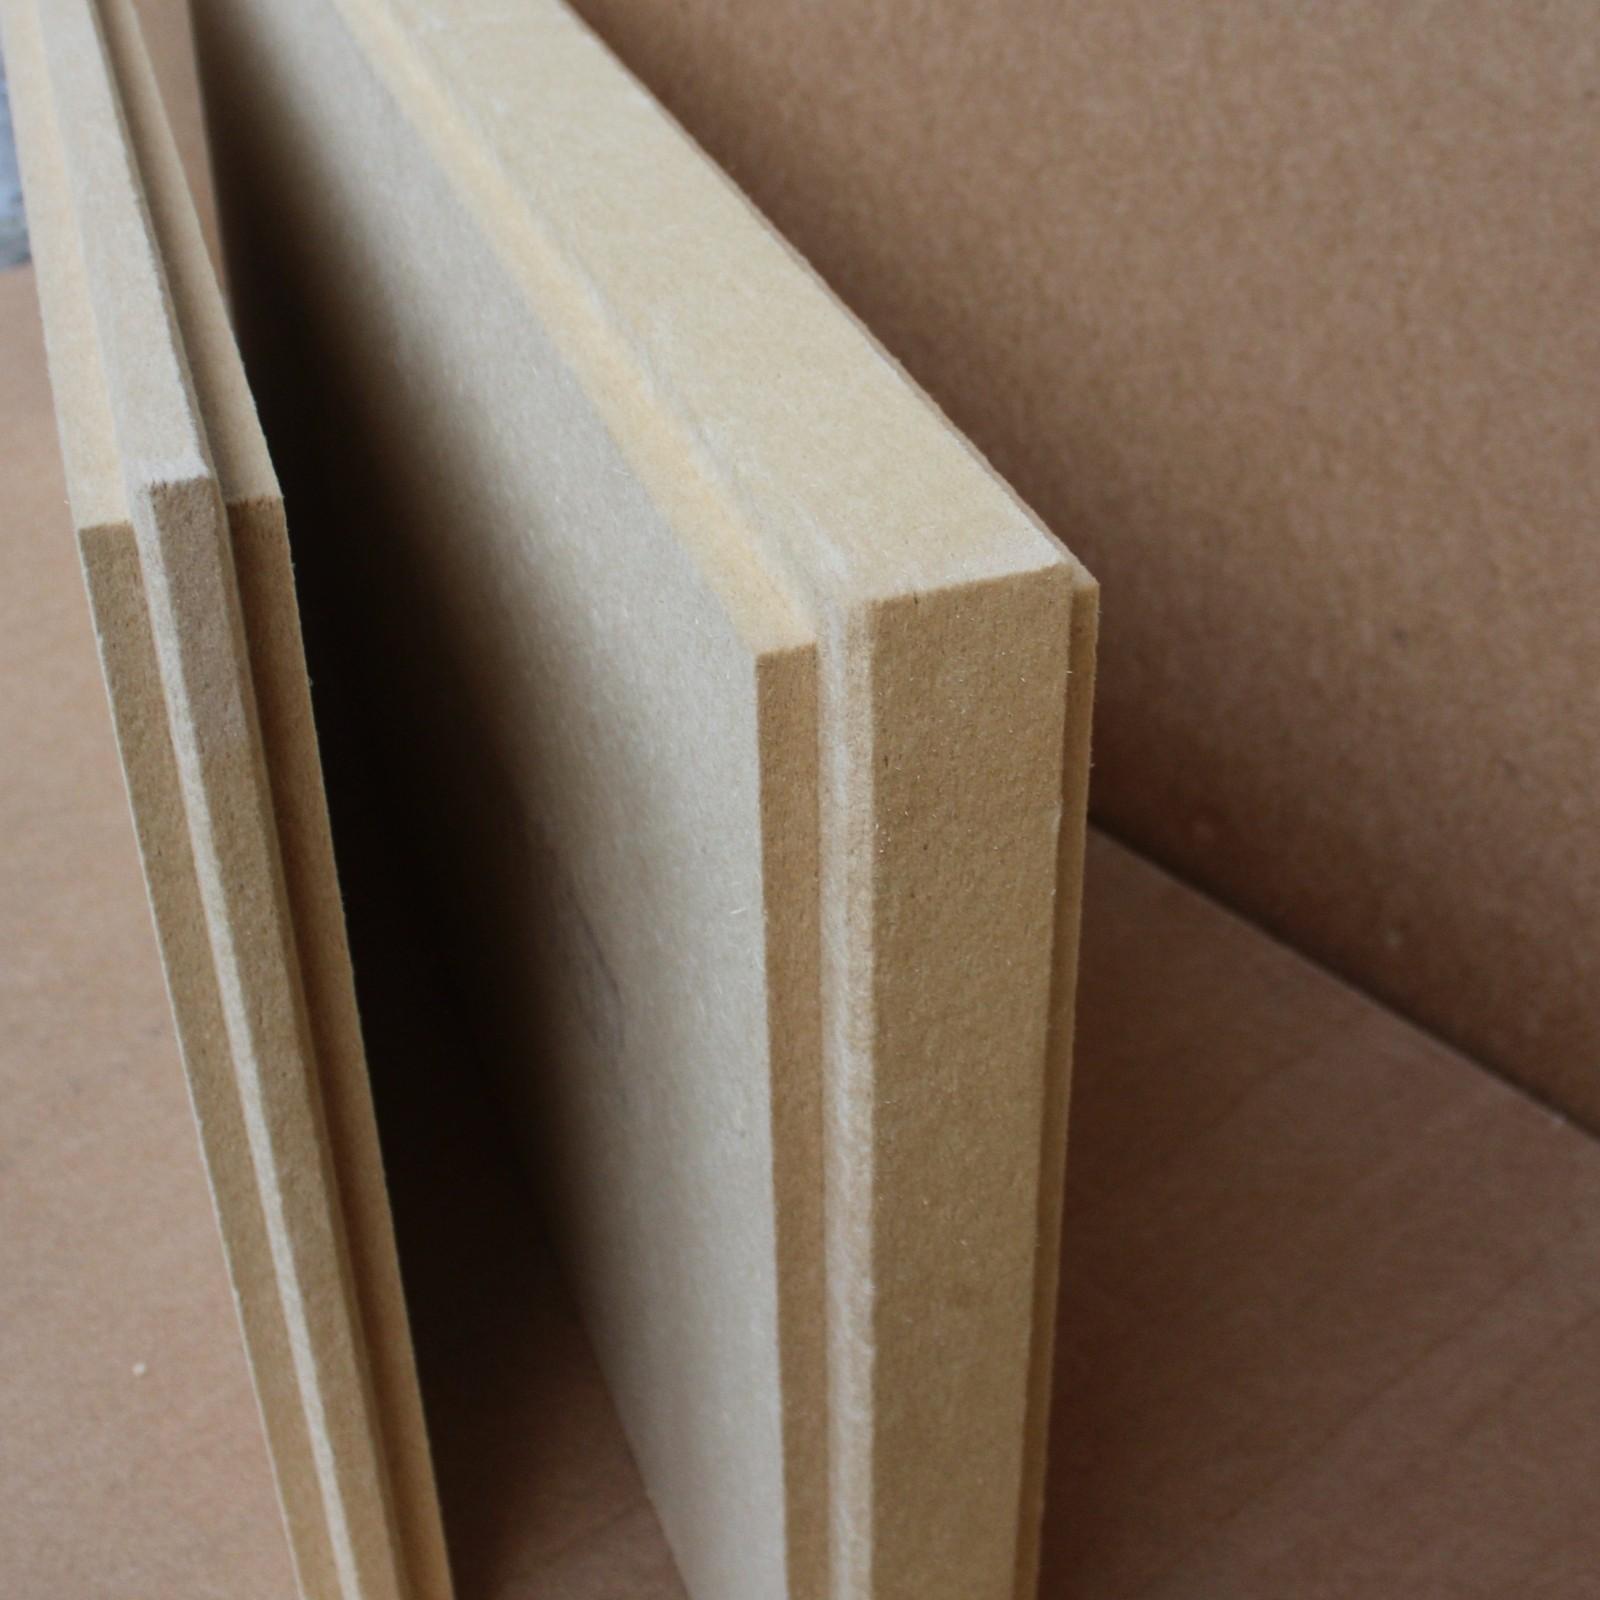 STEICO protect dry 80 mm 4-seitig Nut und Feder